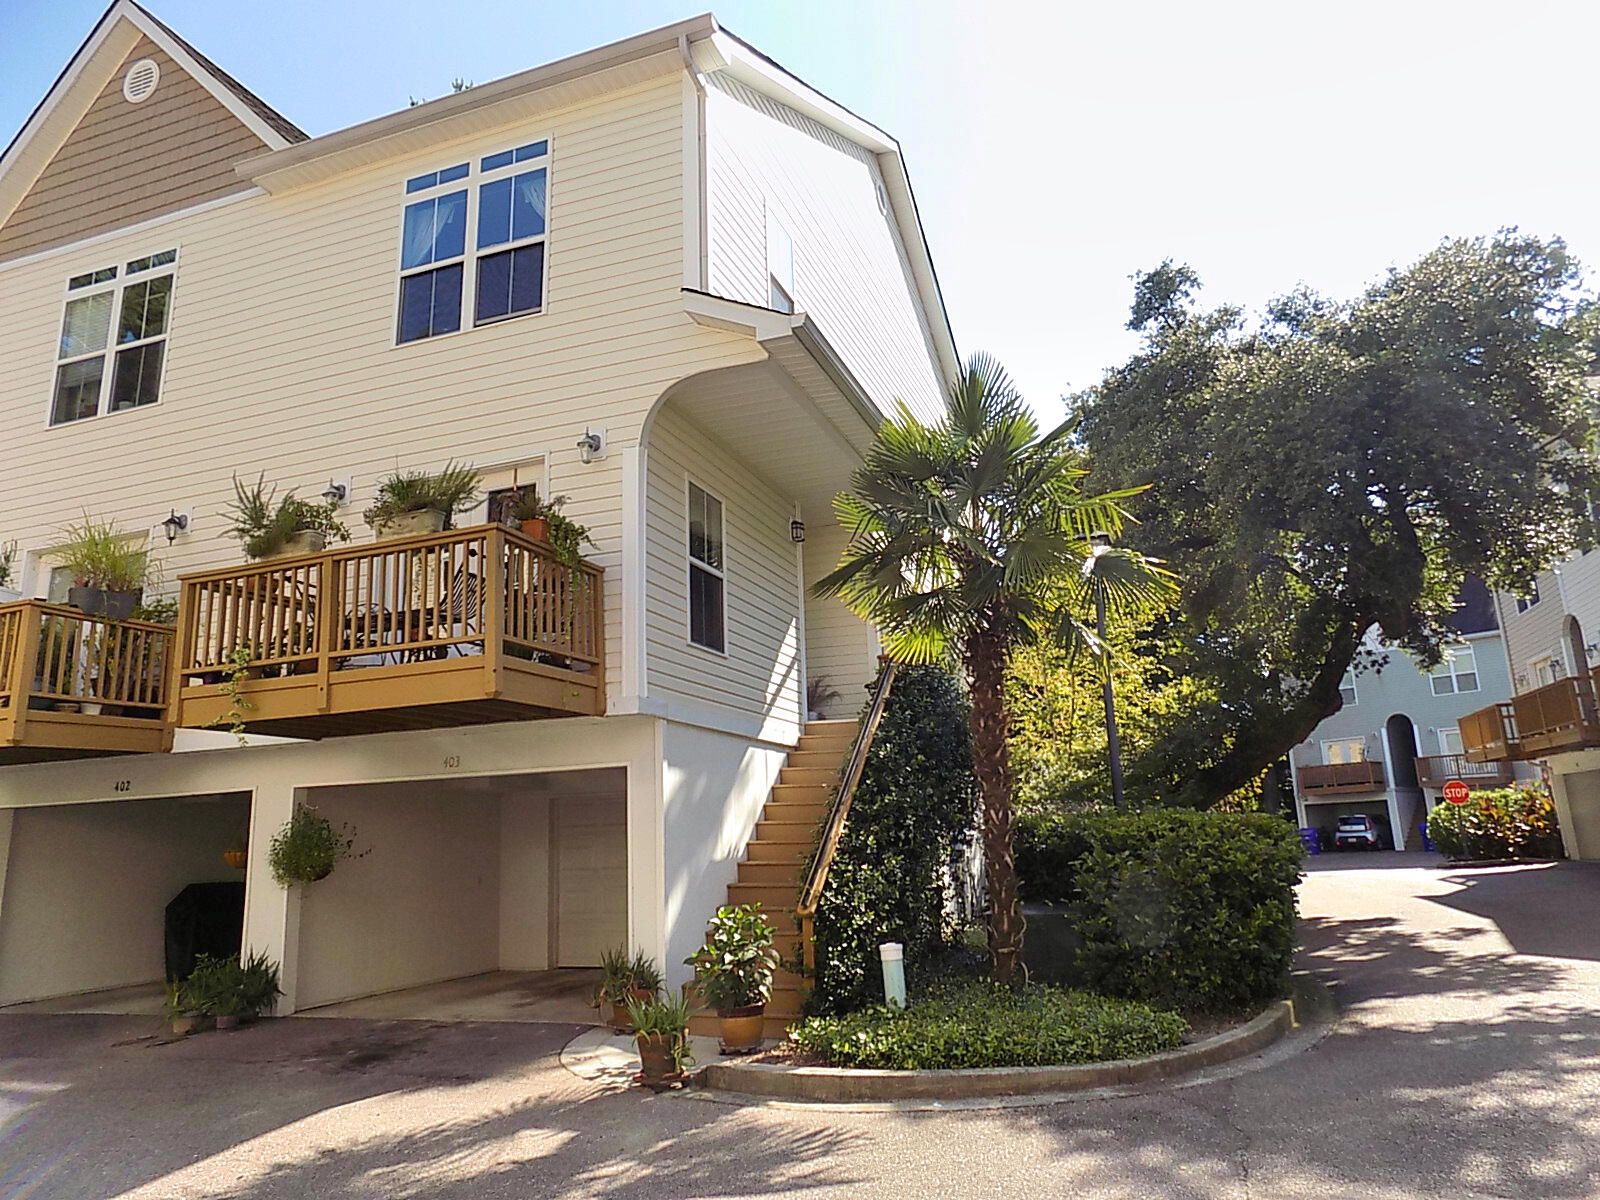 Willow Oaks Homes For Sale - 1829 Dogwood, Charleston, SC - 30